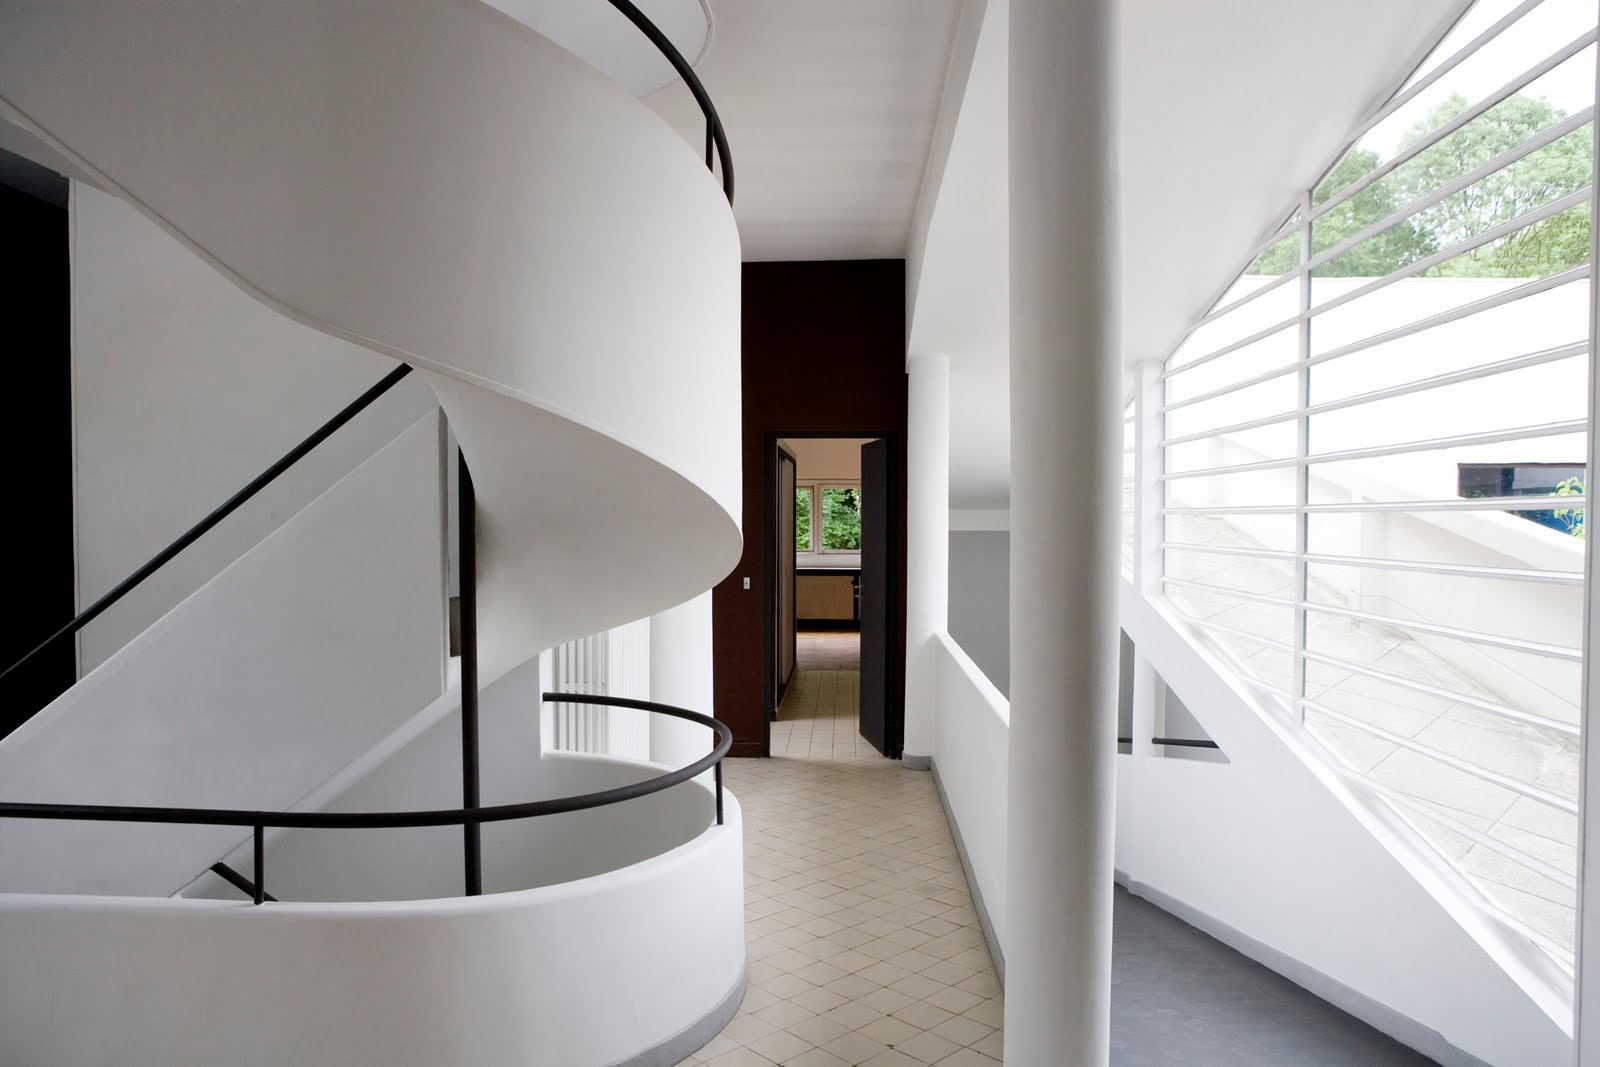 jill paider photography le corbusier 39 s villa savoye